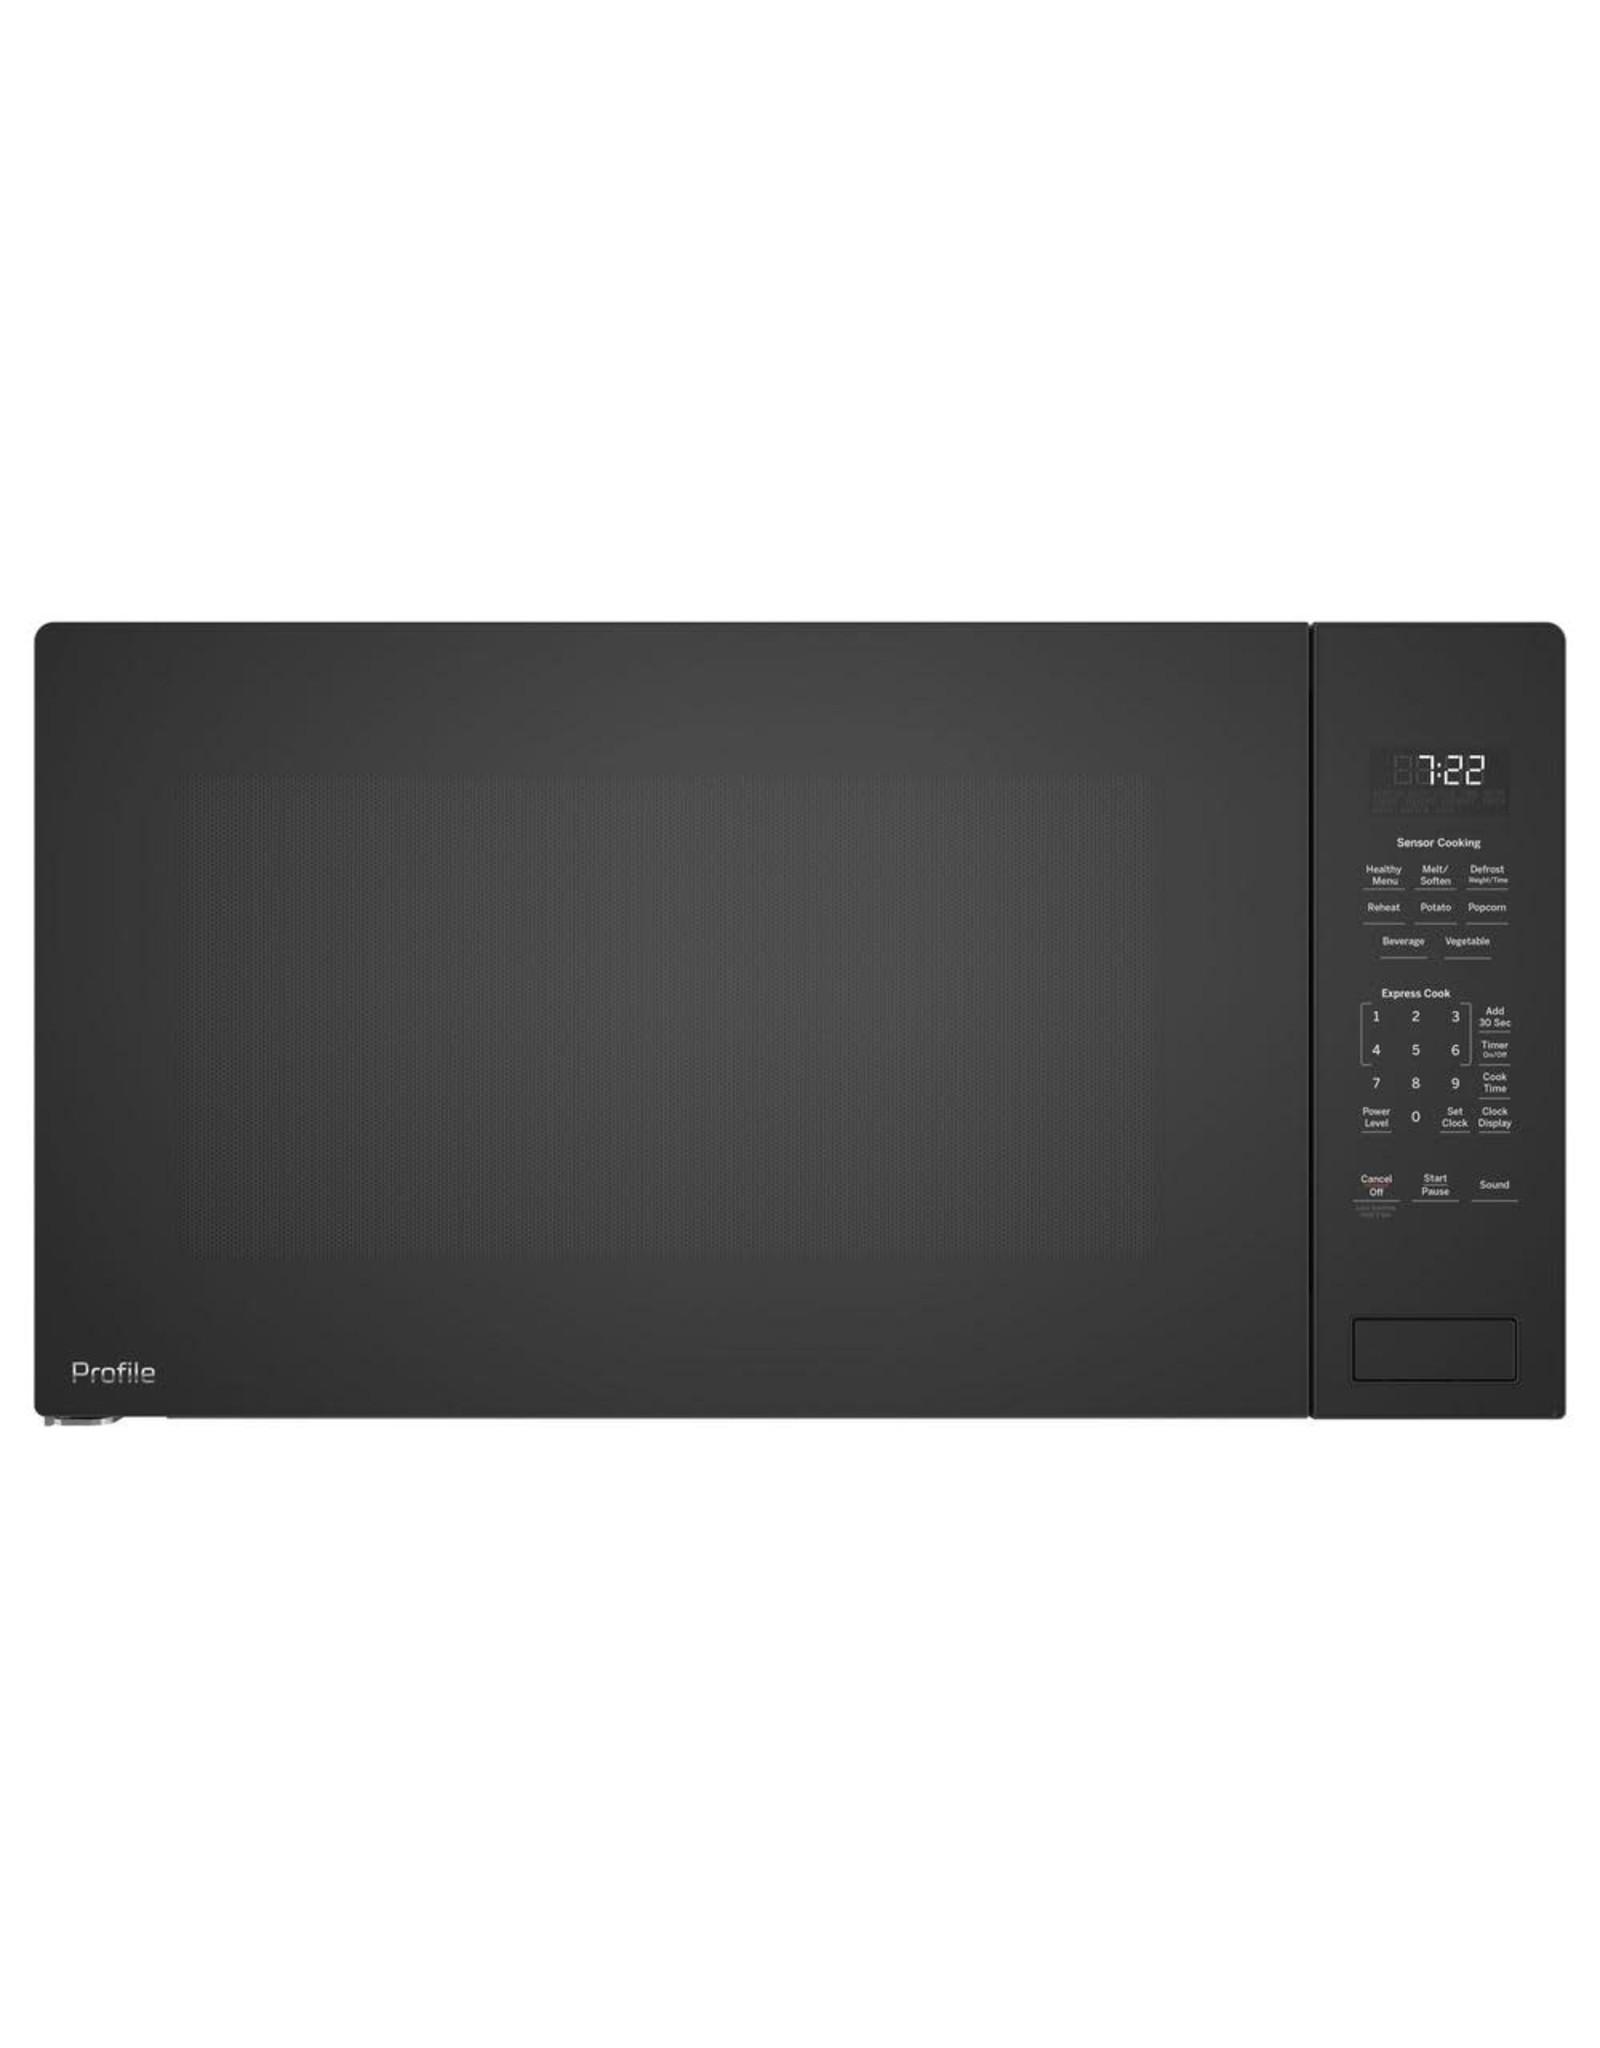 GE PROFILE PEB7227DLBB Profile 2.2 cu. ft. Countertop Microwave in Black with Sensor Cooking